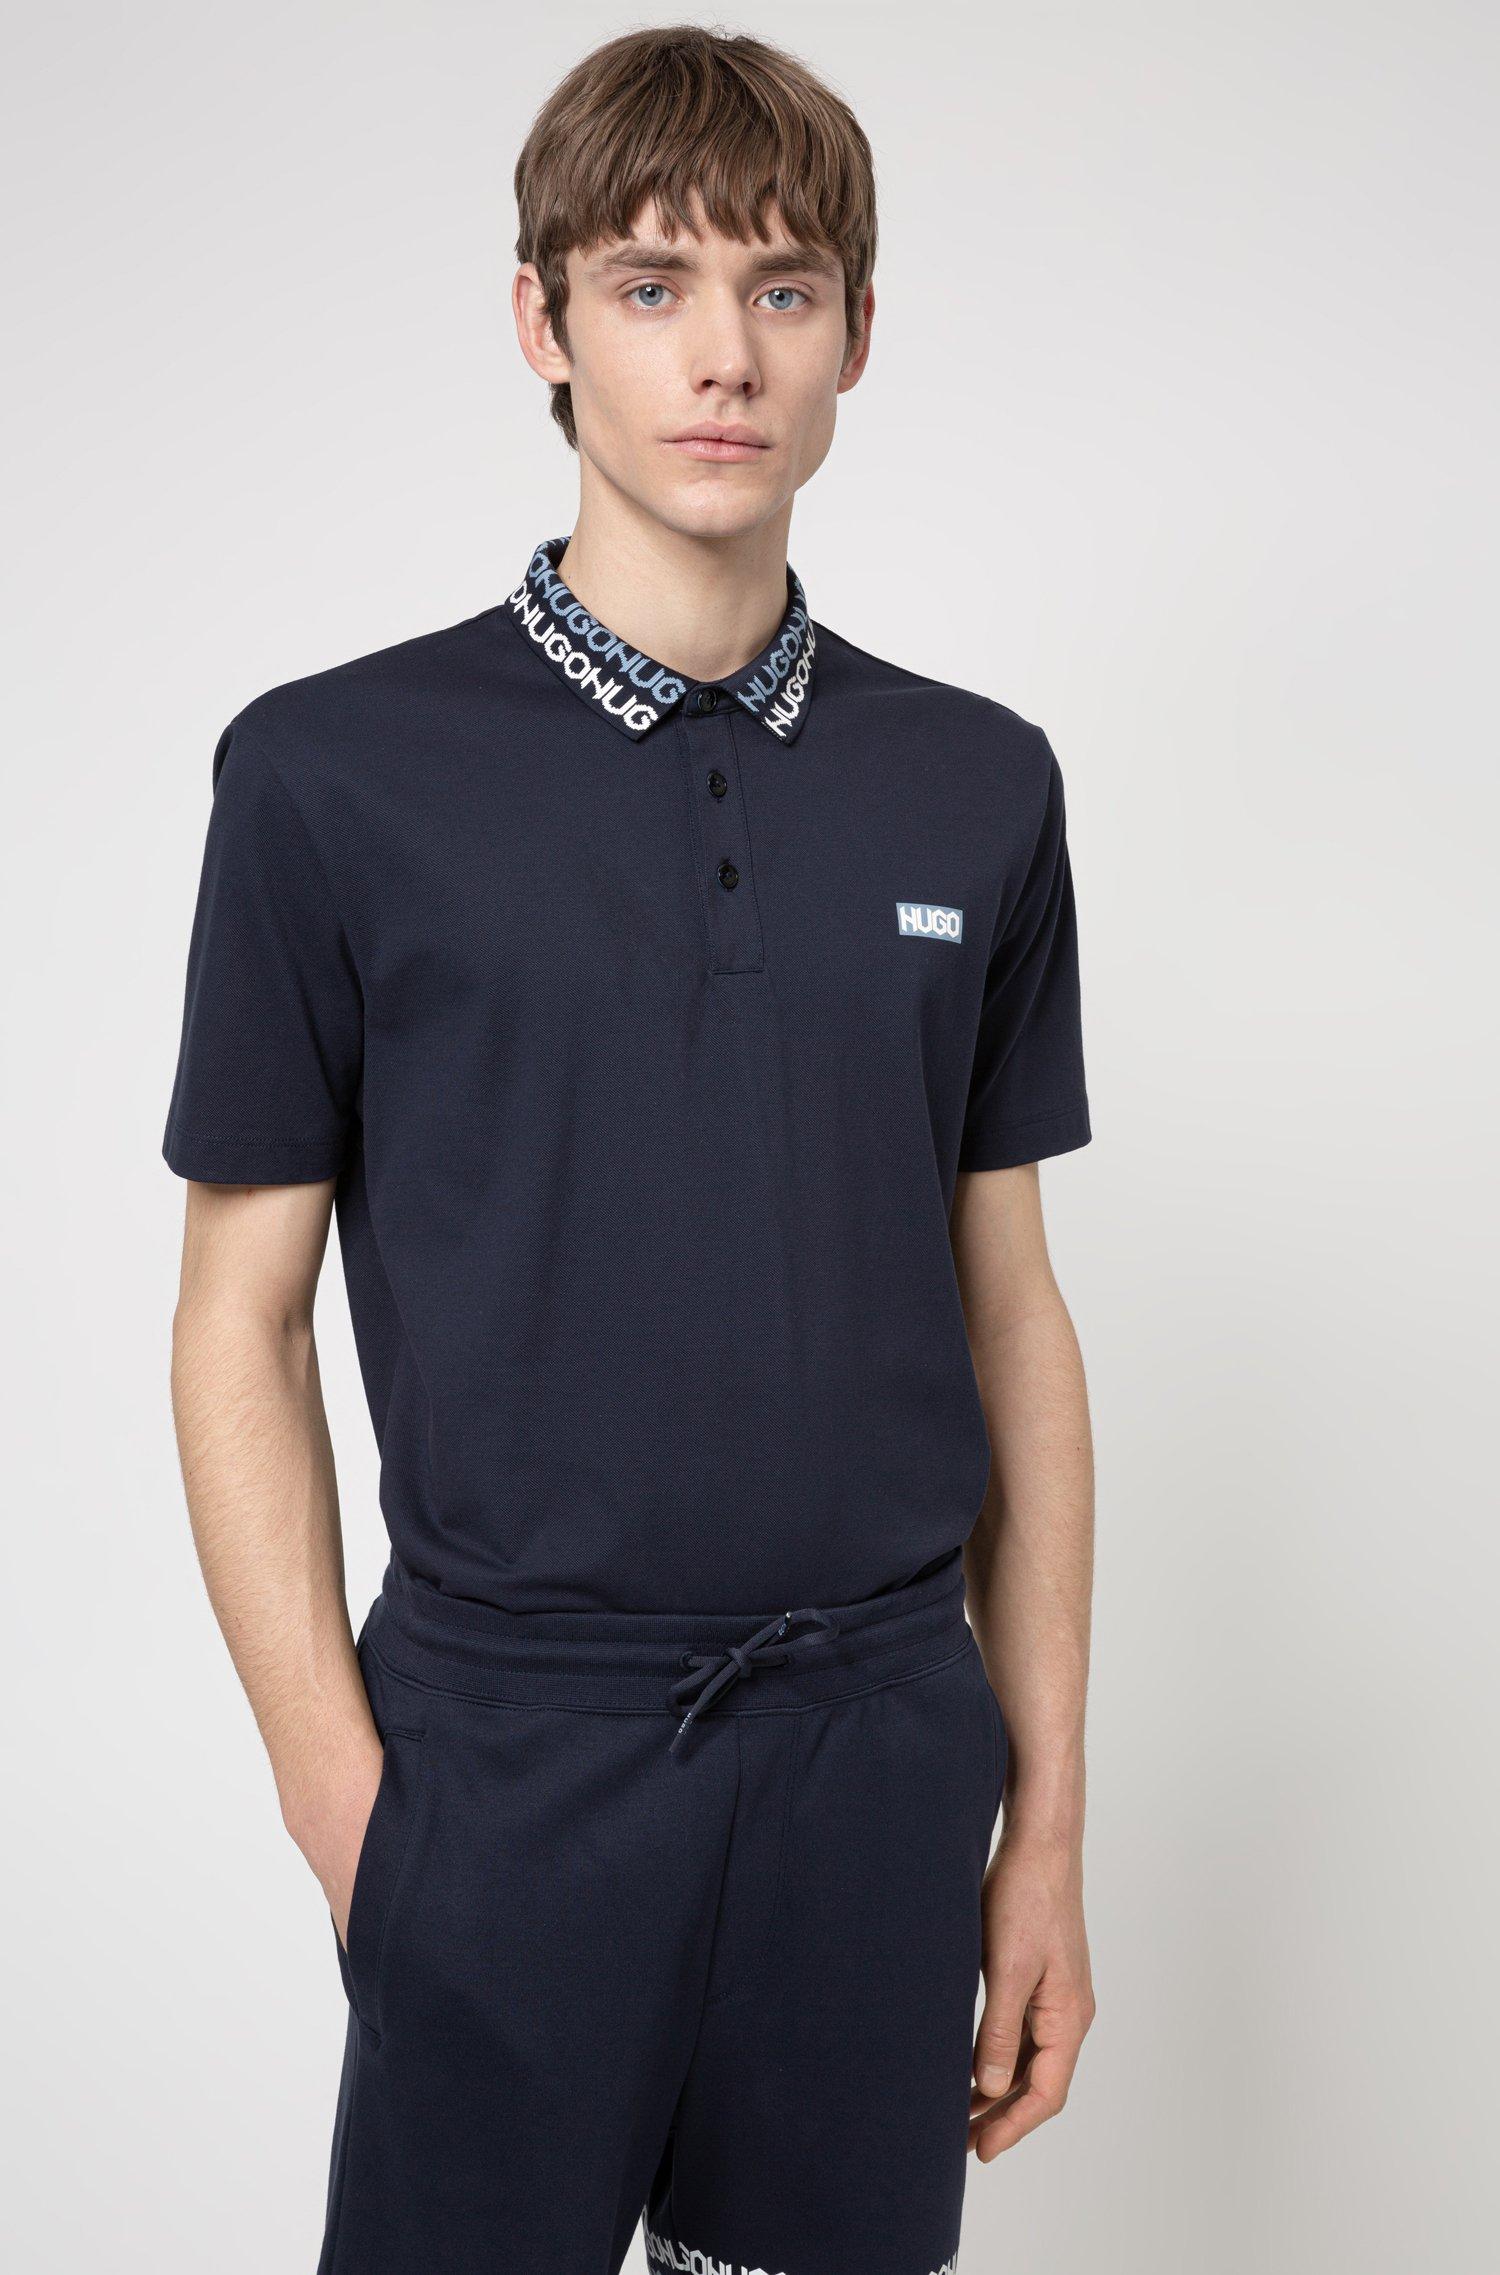 Permafit-cotton polo shirt with tyre-print logos, Dark Blue